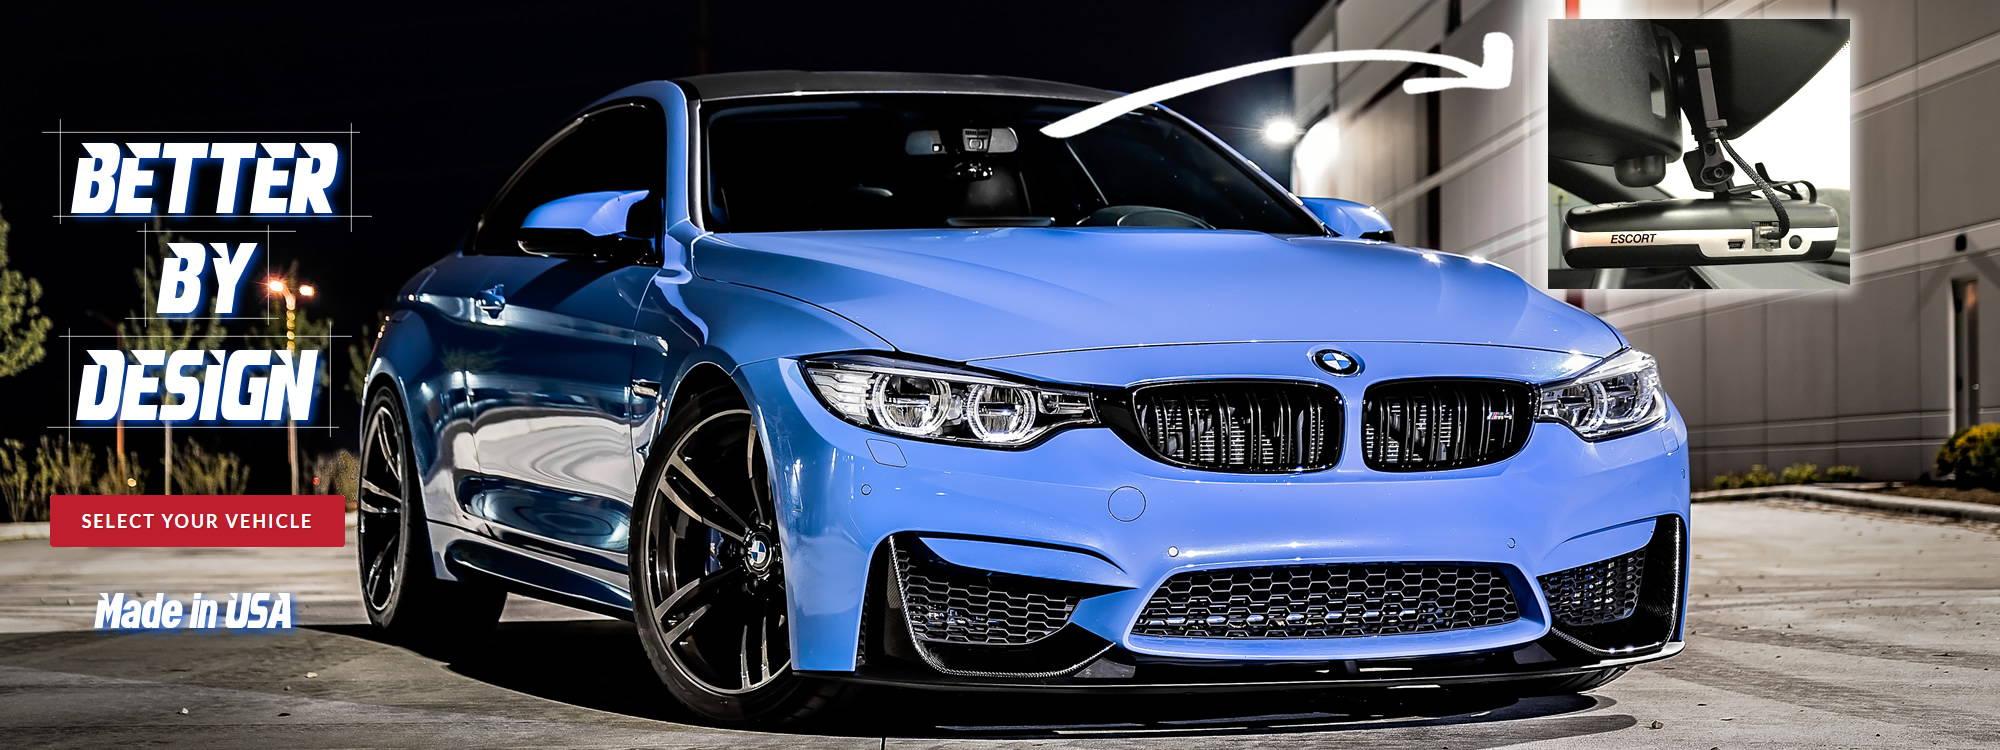 BlendMount Custom BMW rear view mirror